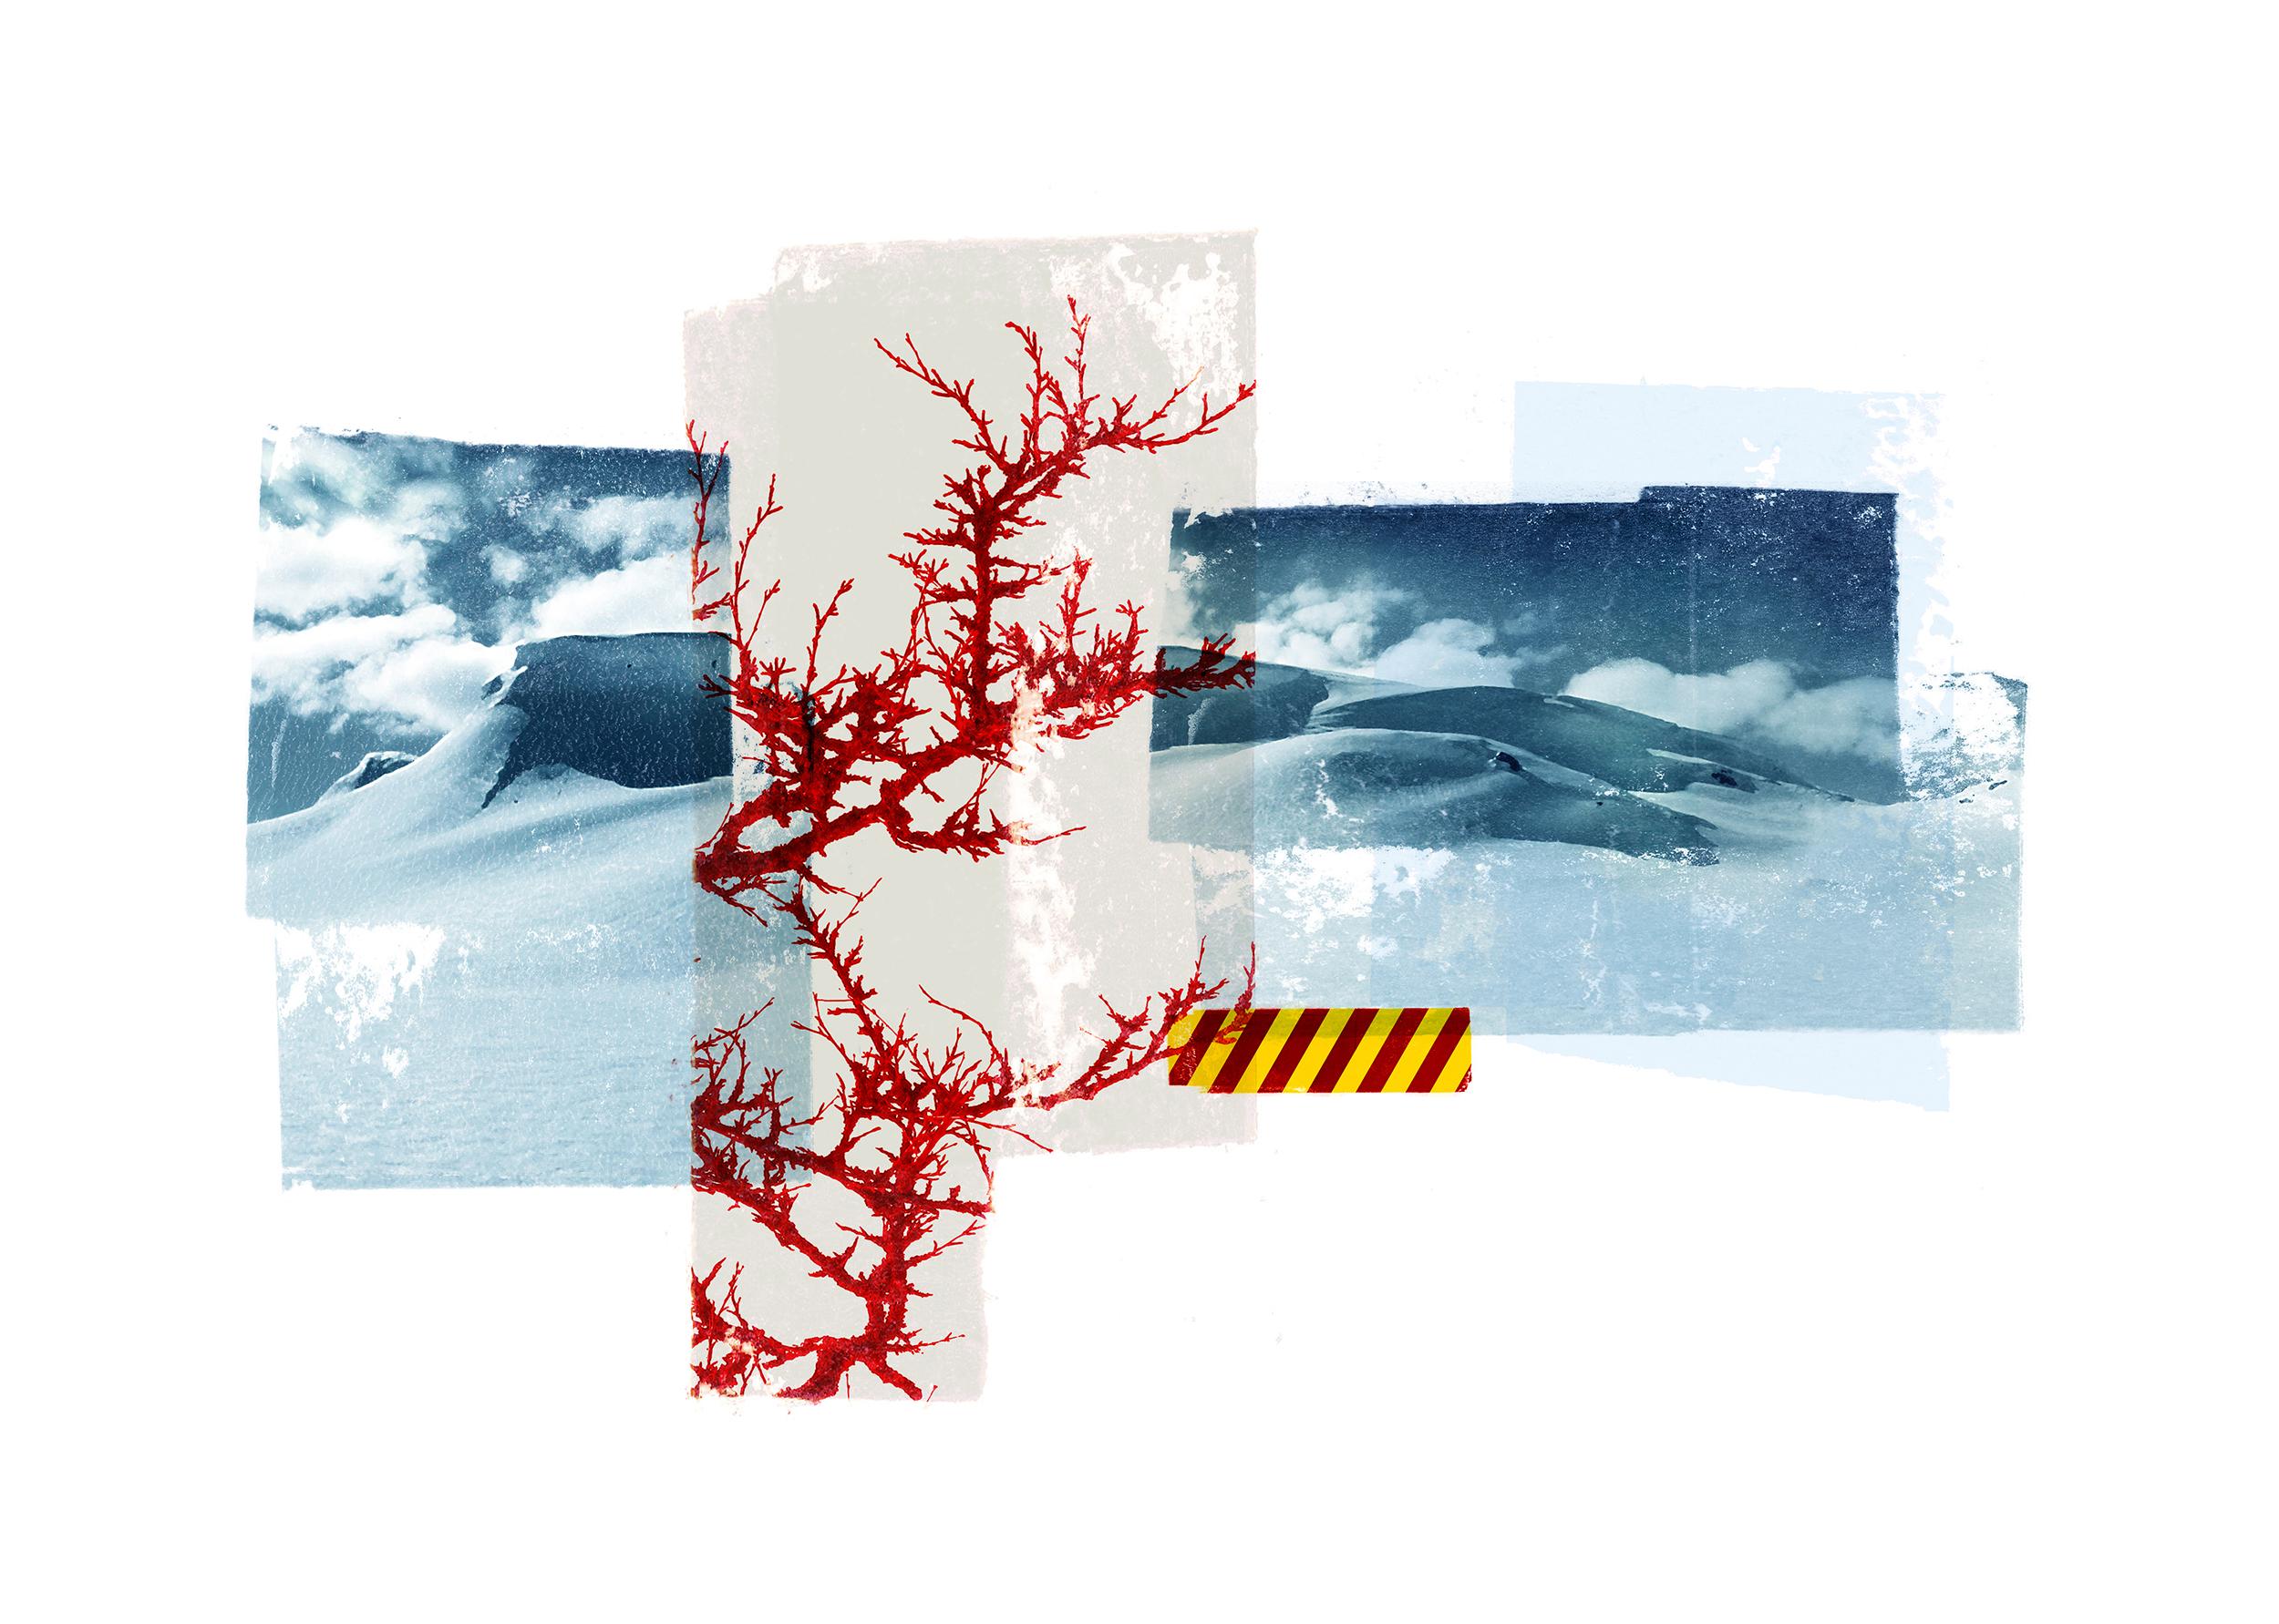 Reservoir / Red birch / Skavl ( Setesdal )  Photo litho / BFK Rives 250 gr 35 x 25 cm / 13,7 x 10 in Edition of 100 + 20 Ap Editeur: IDEM PARIS / Per Fronth Studios   21/2015: